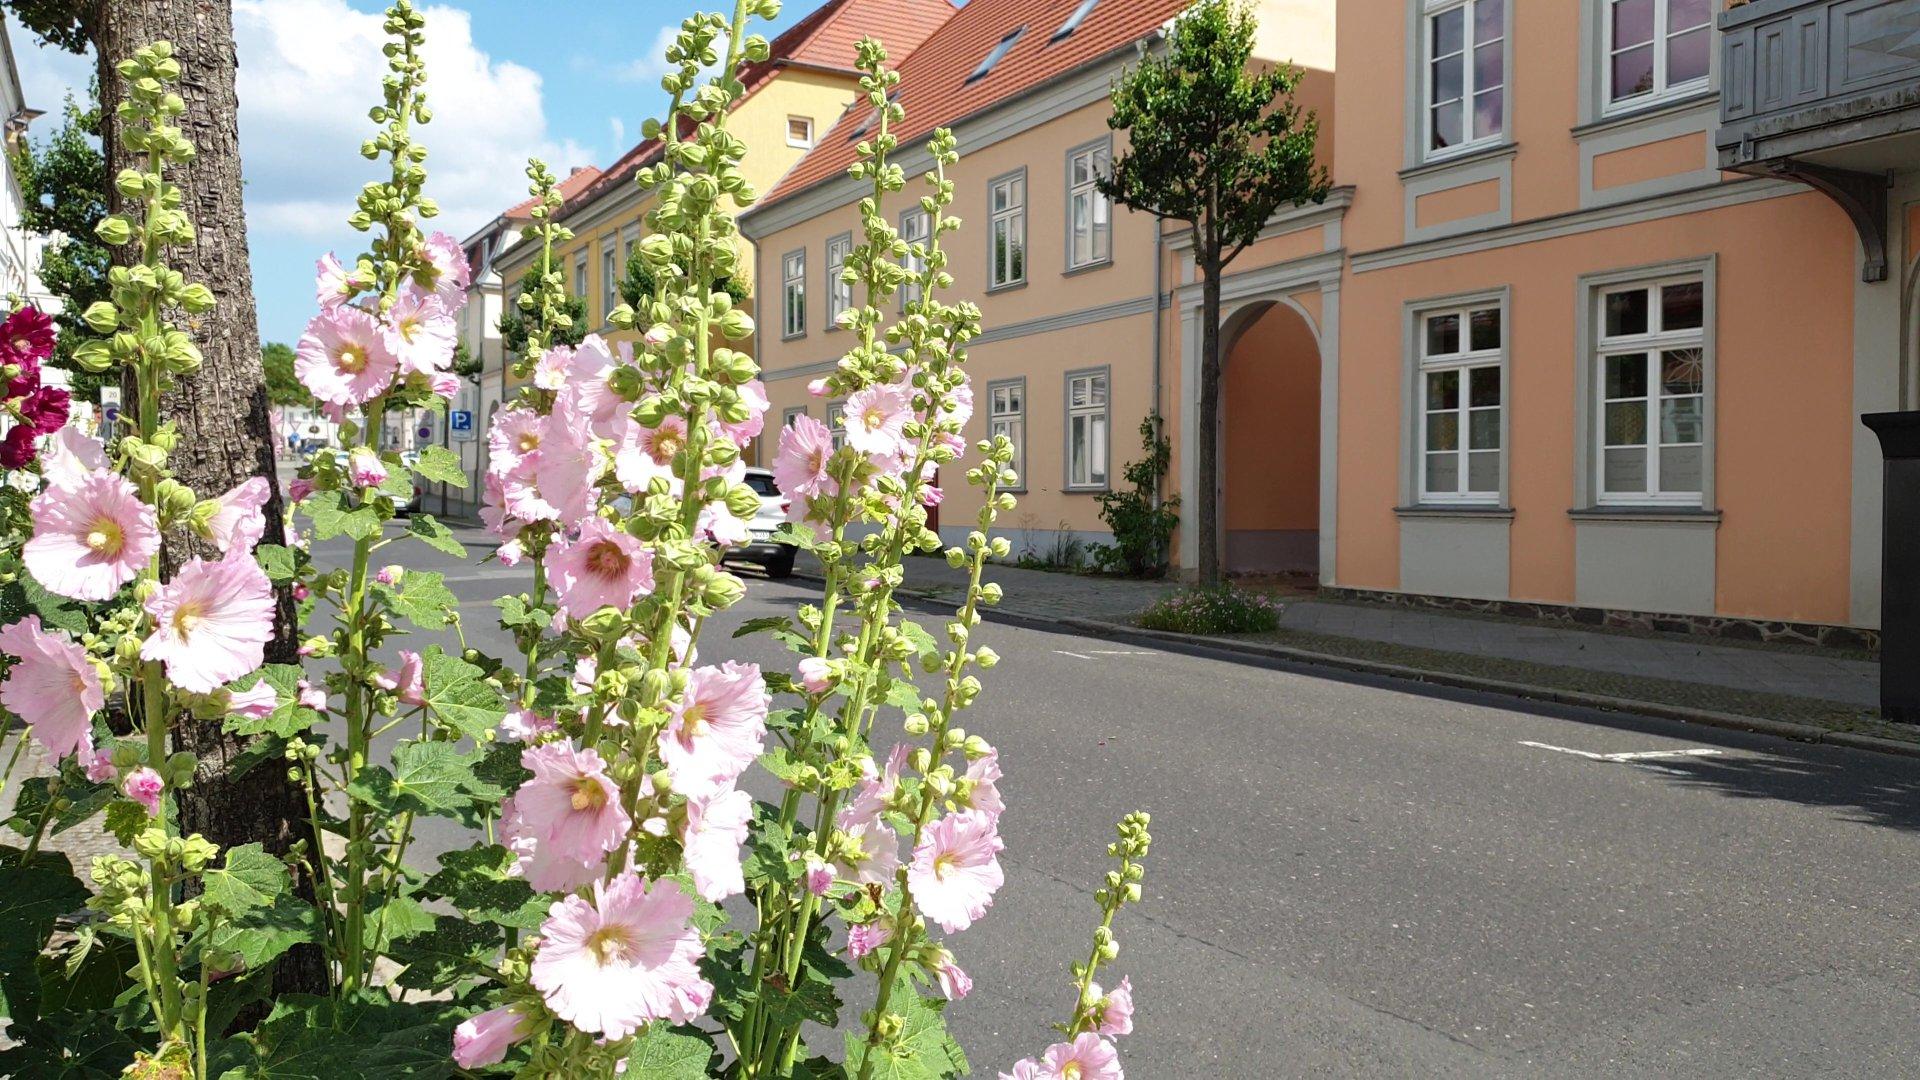 Neustrelitz Seestraße Blumen